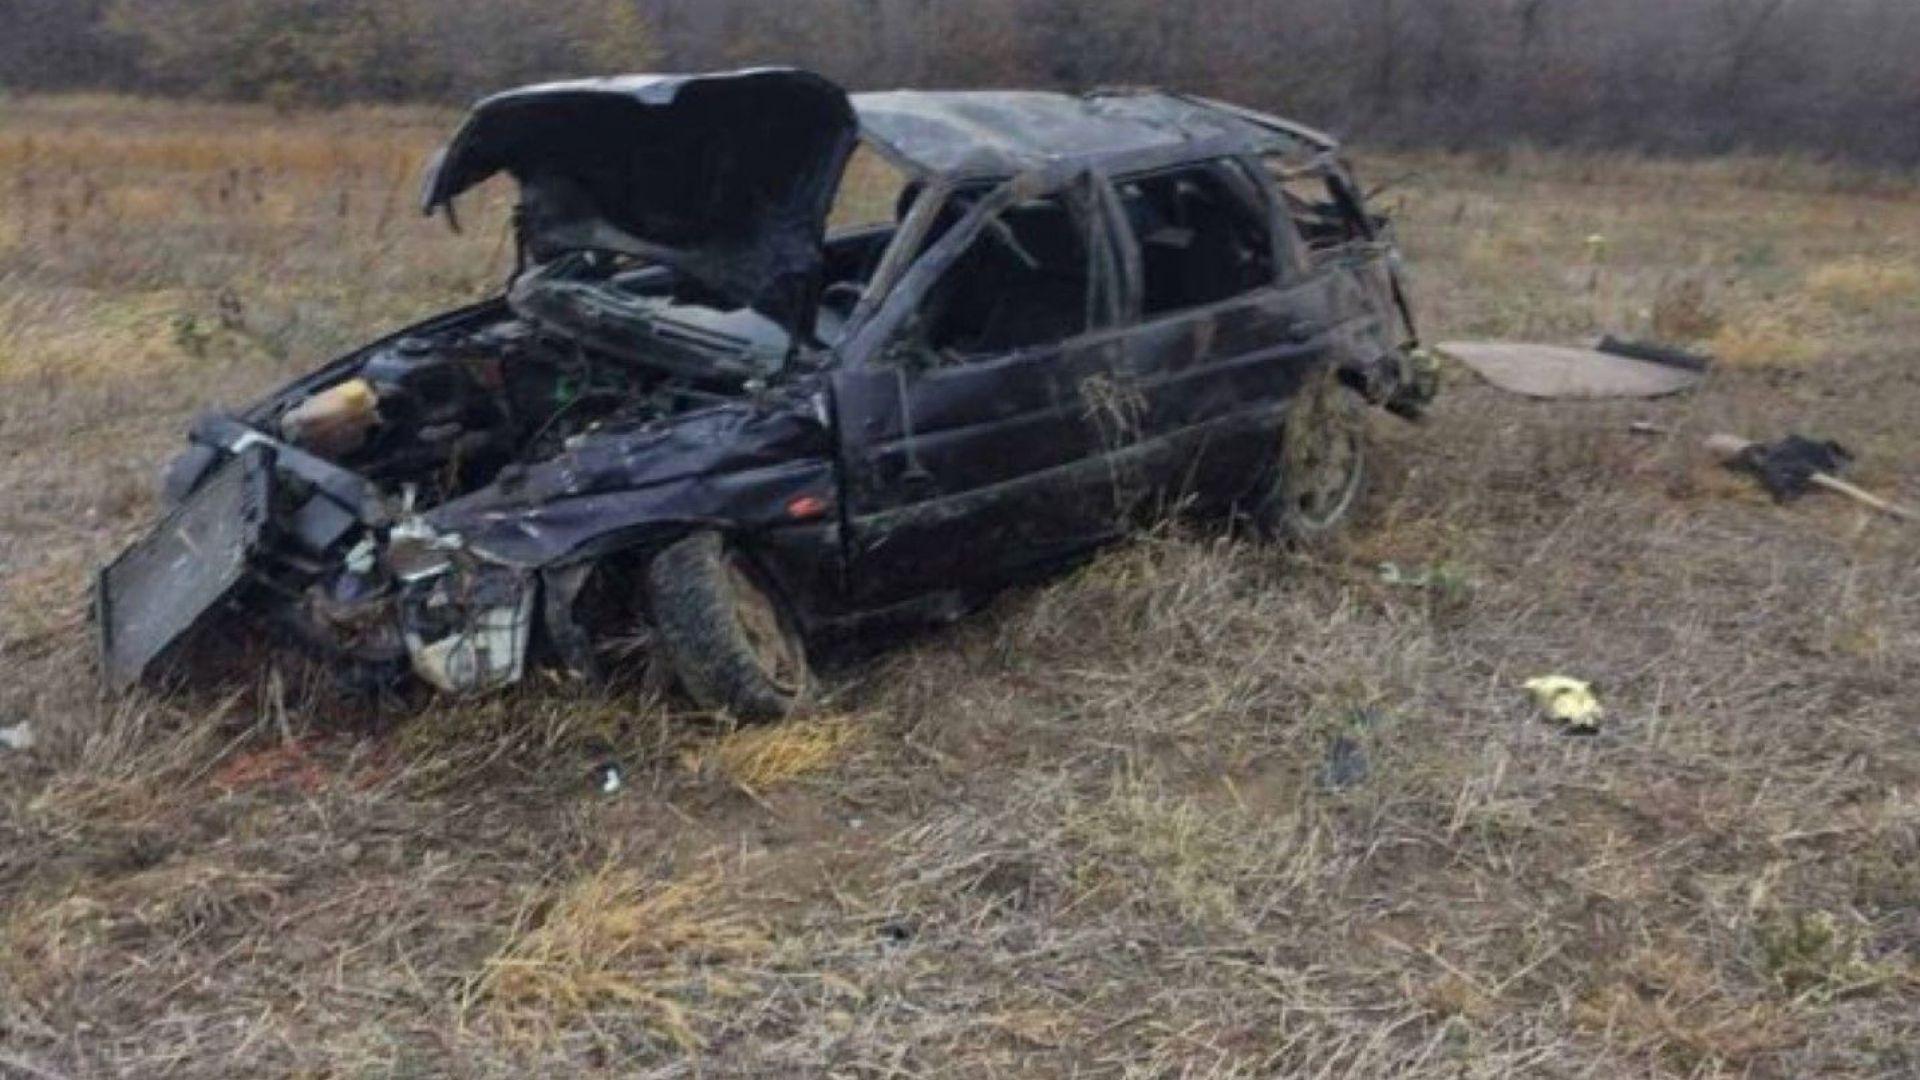 Трима души - шофьор и двамата му спътници, загинаха днес